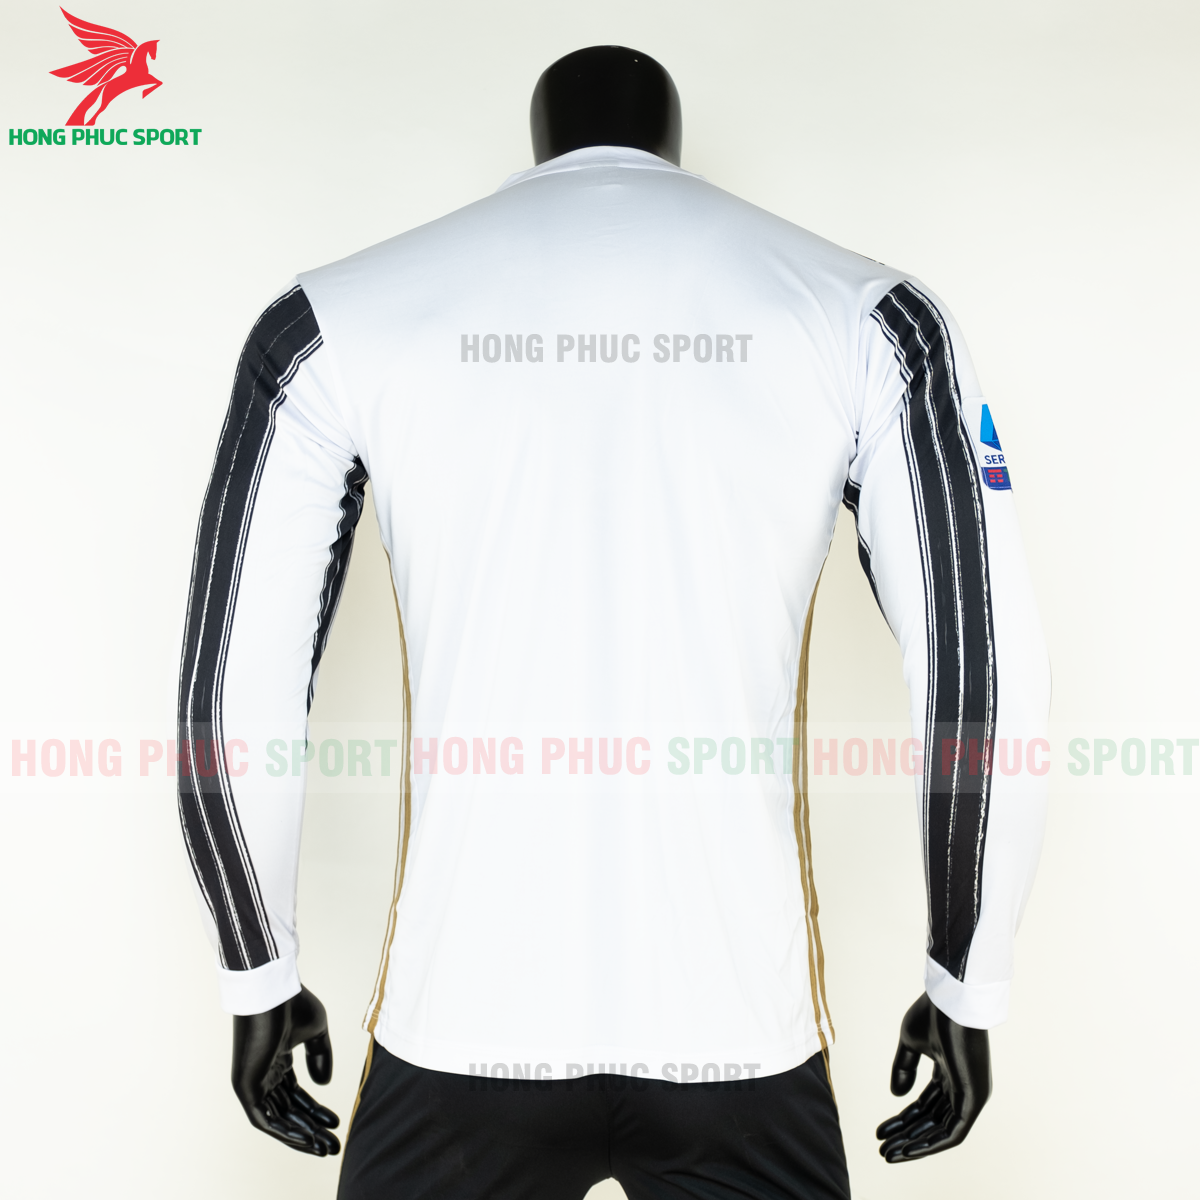 https://cdn.hongphucsport.com/unsafe/s4.shopbay.vn/files/285/ao-dai-tay-juventus-2020-san-nha-7-5f8fbde476e87.png